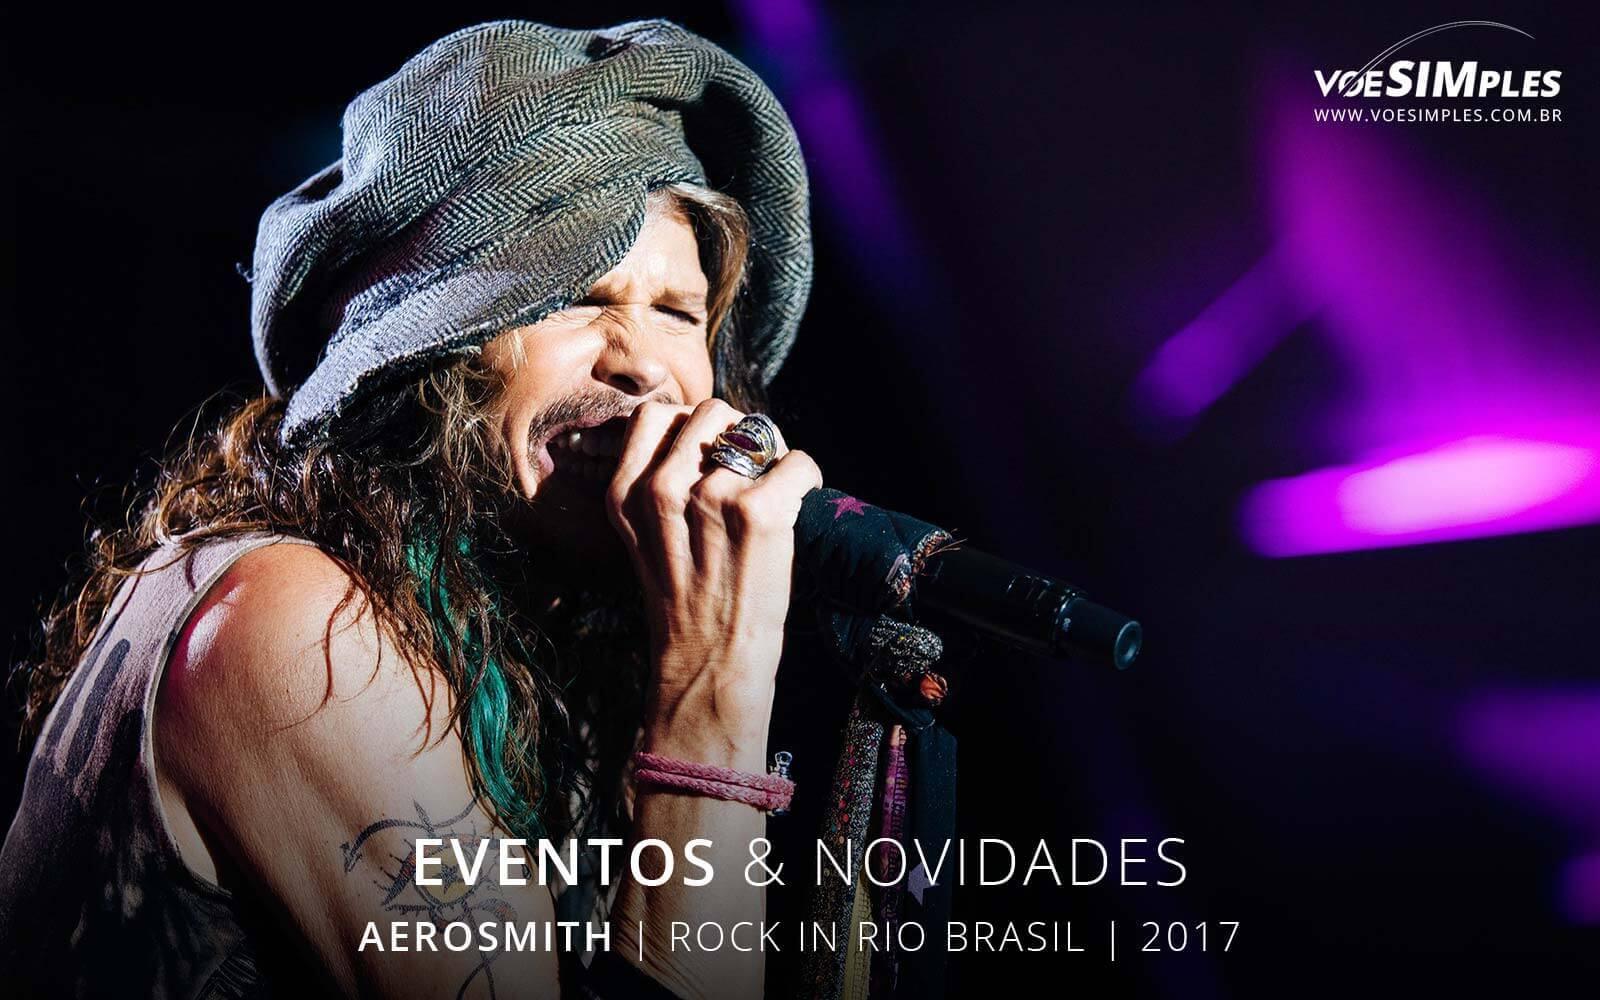 show-aerosmith-brasil-2017-voesimples-passagens-aereas-promocionais-aerosmith-passagens-promo-aerosmith-2017